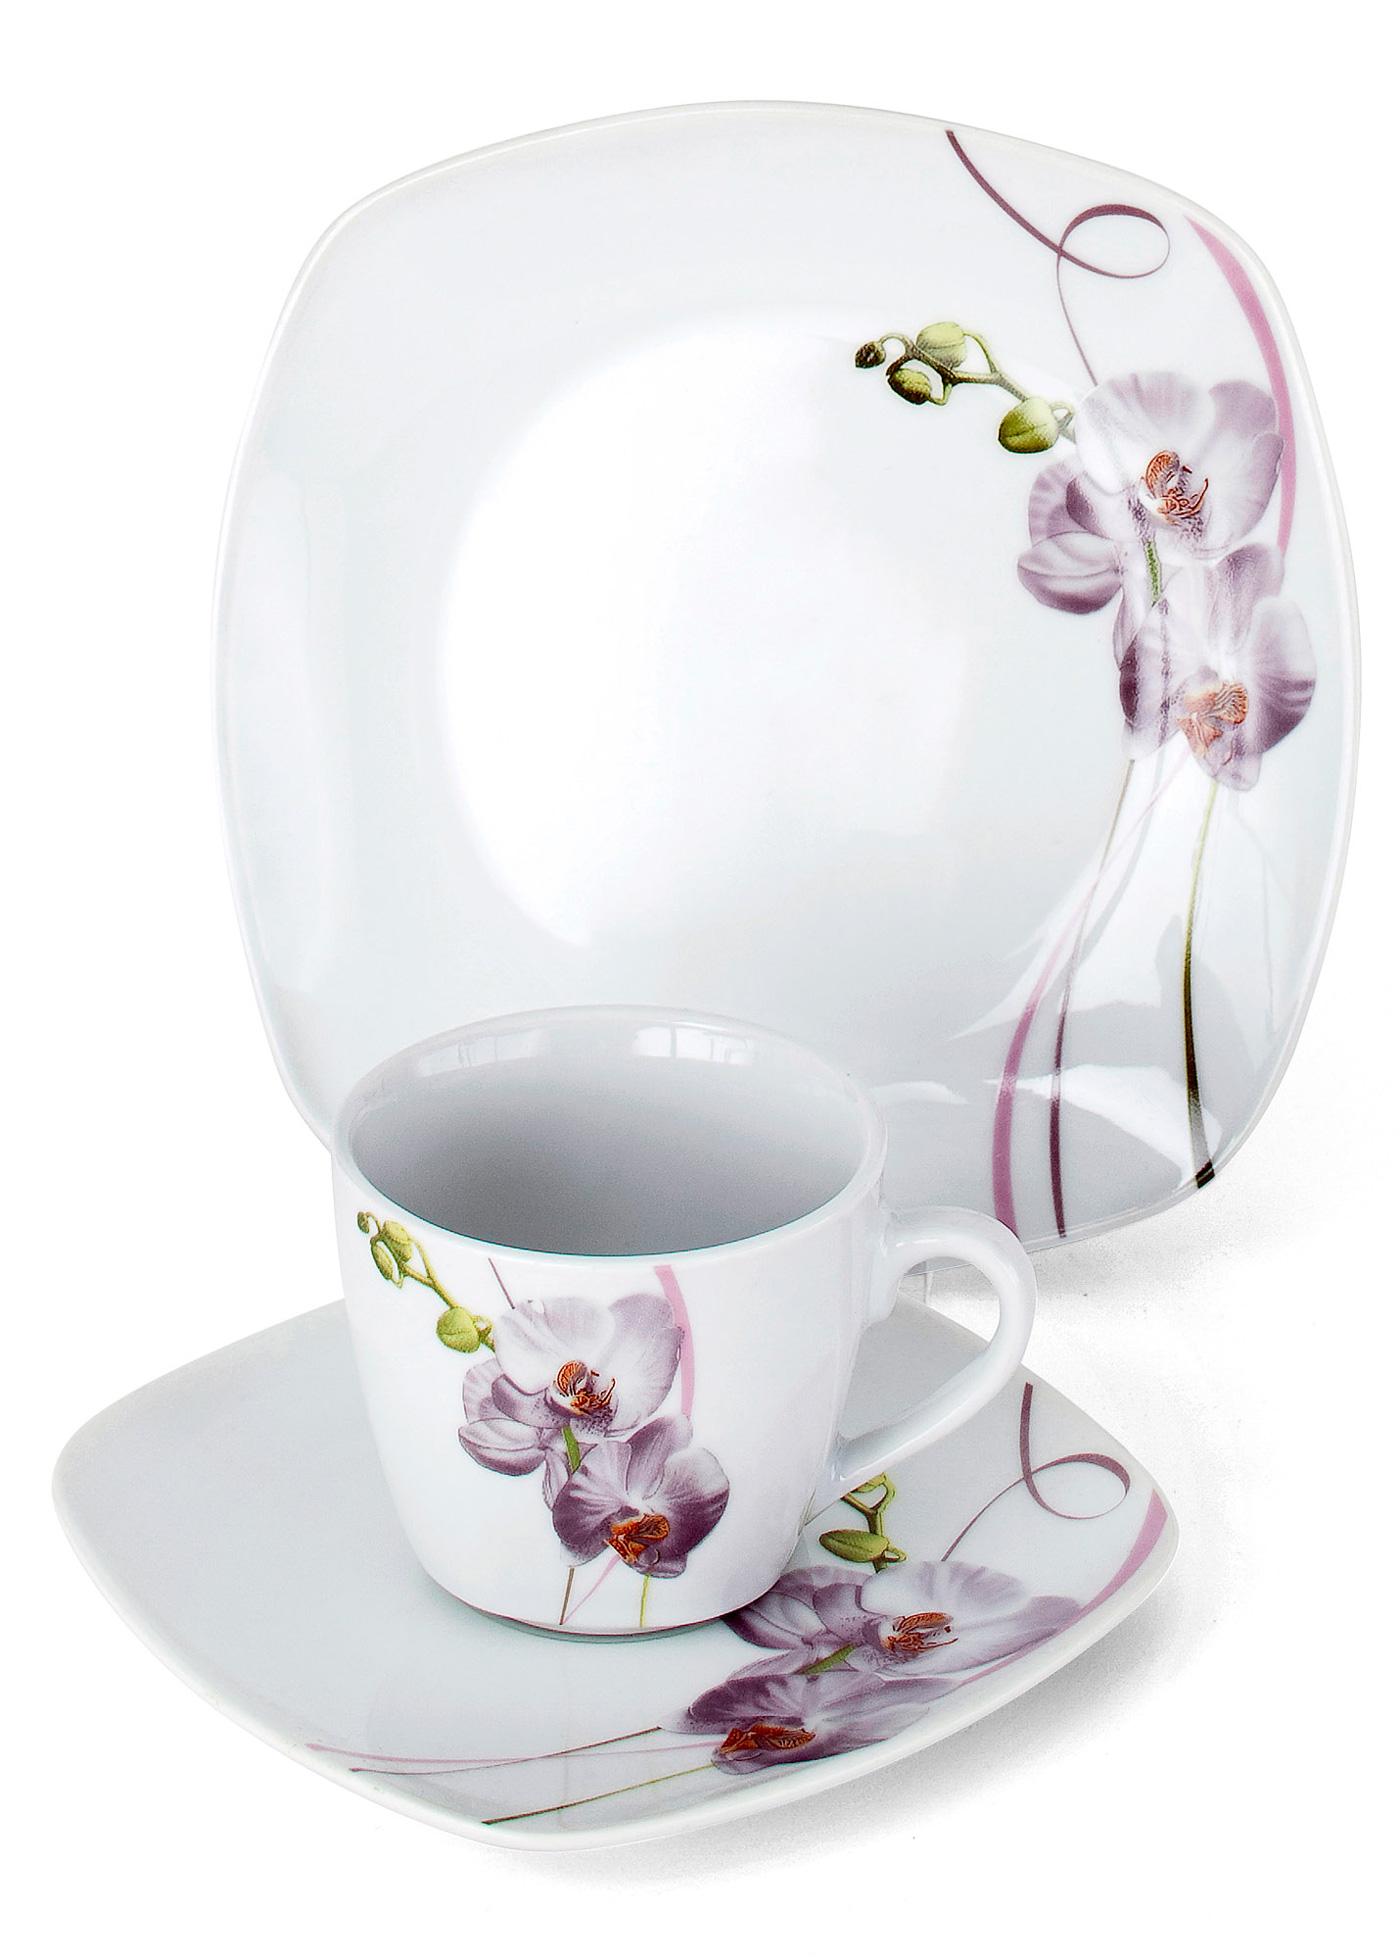 service orchidee kaffeeservice 18 tlg set in wei von bonprix. Black Bedroom Furniture Sets. Home Design Ideas